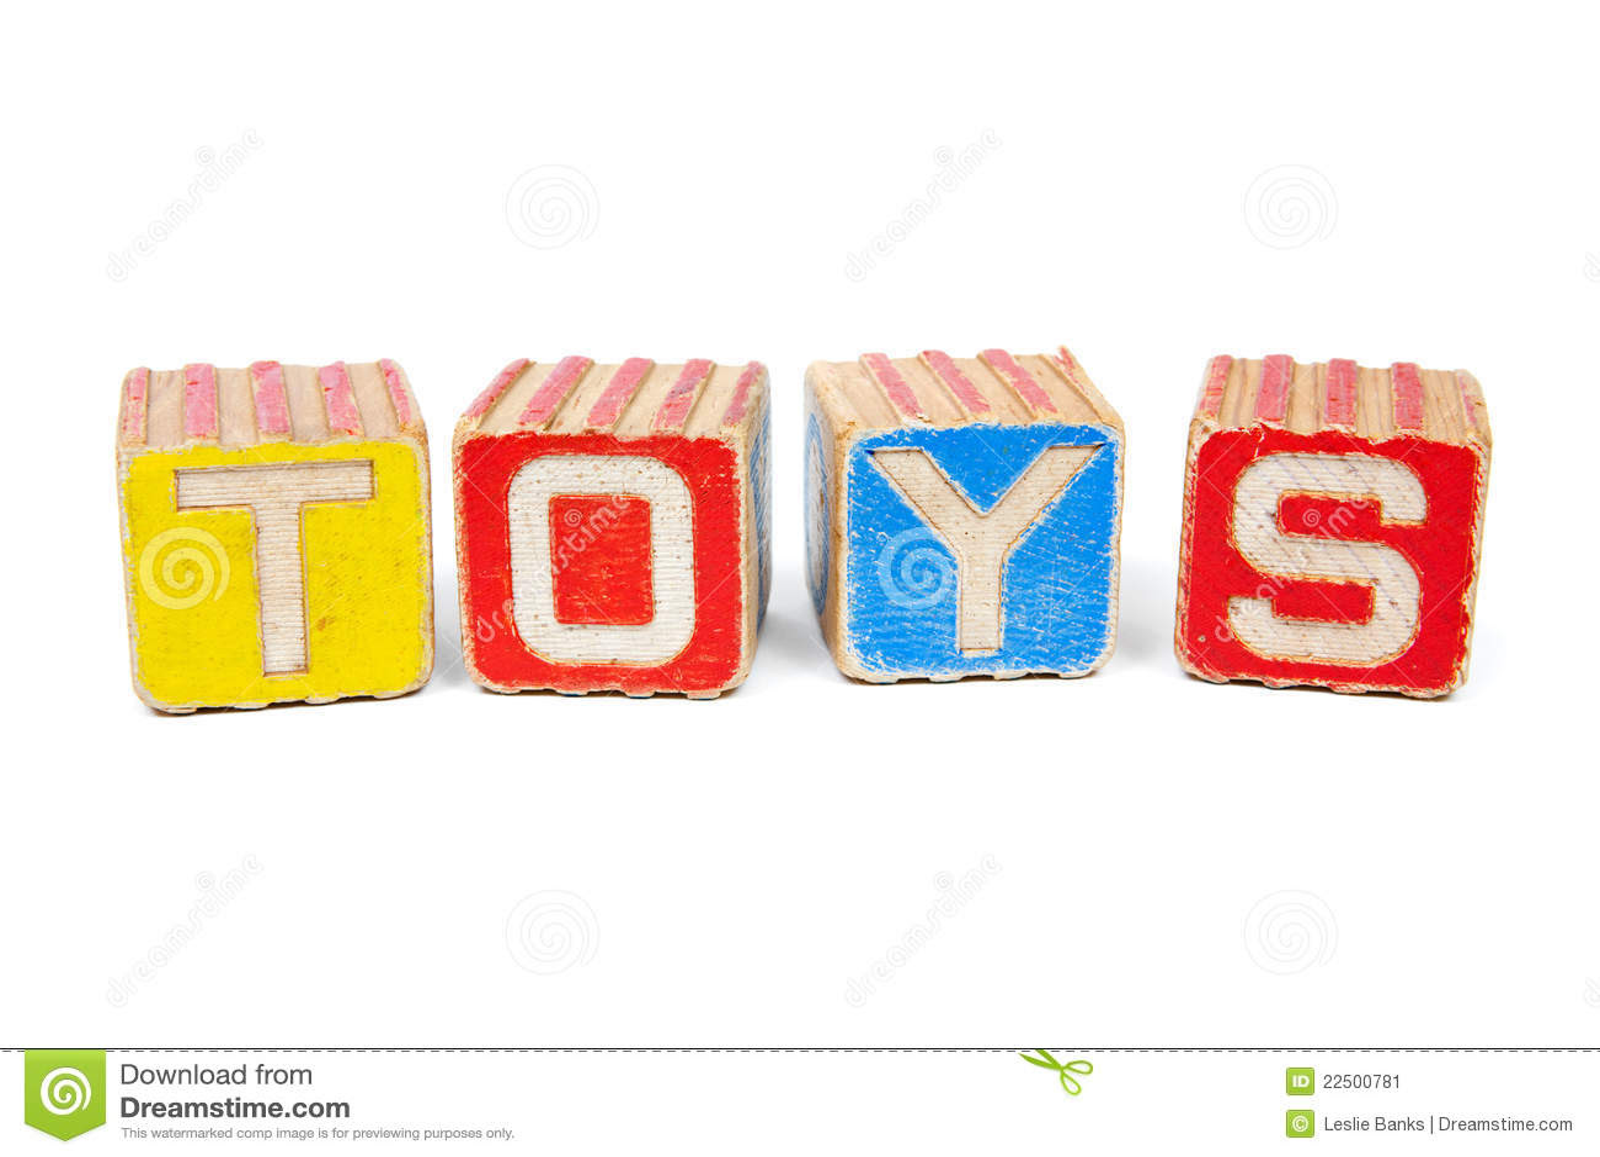 Vintage Wooden Toy Blocks